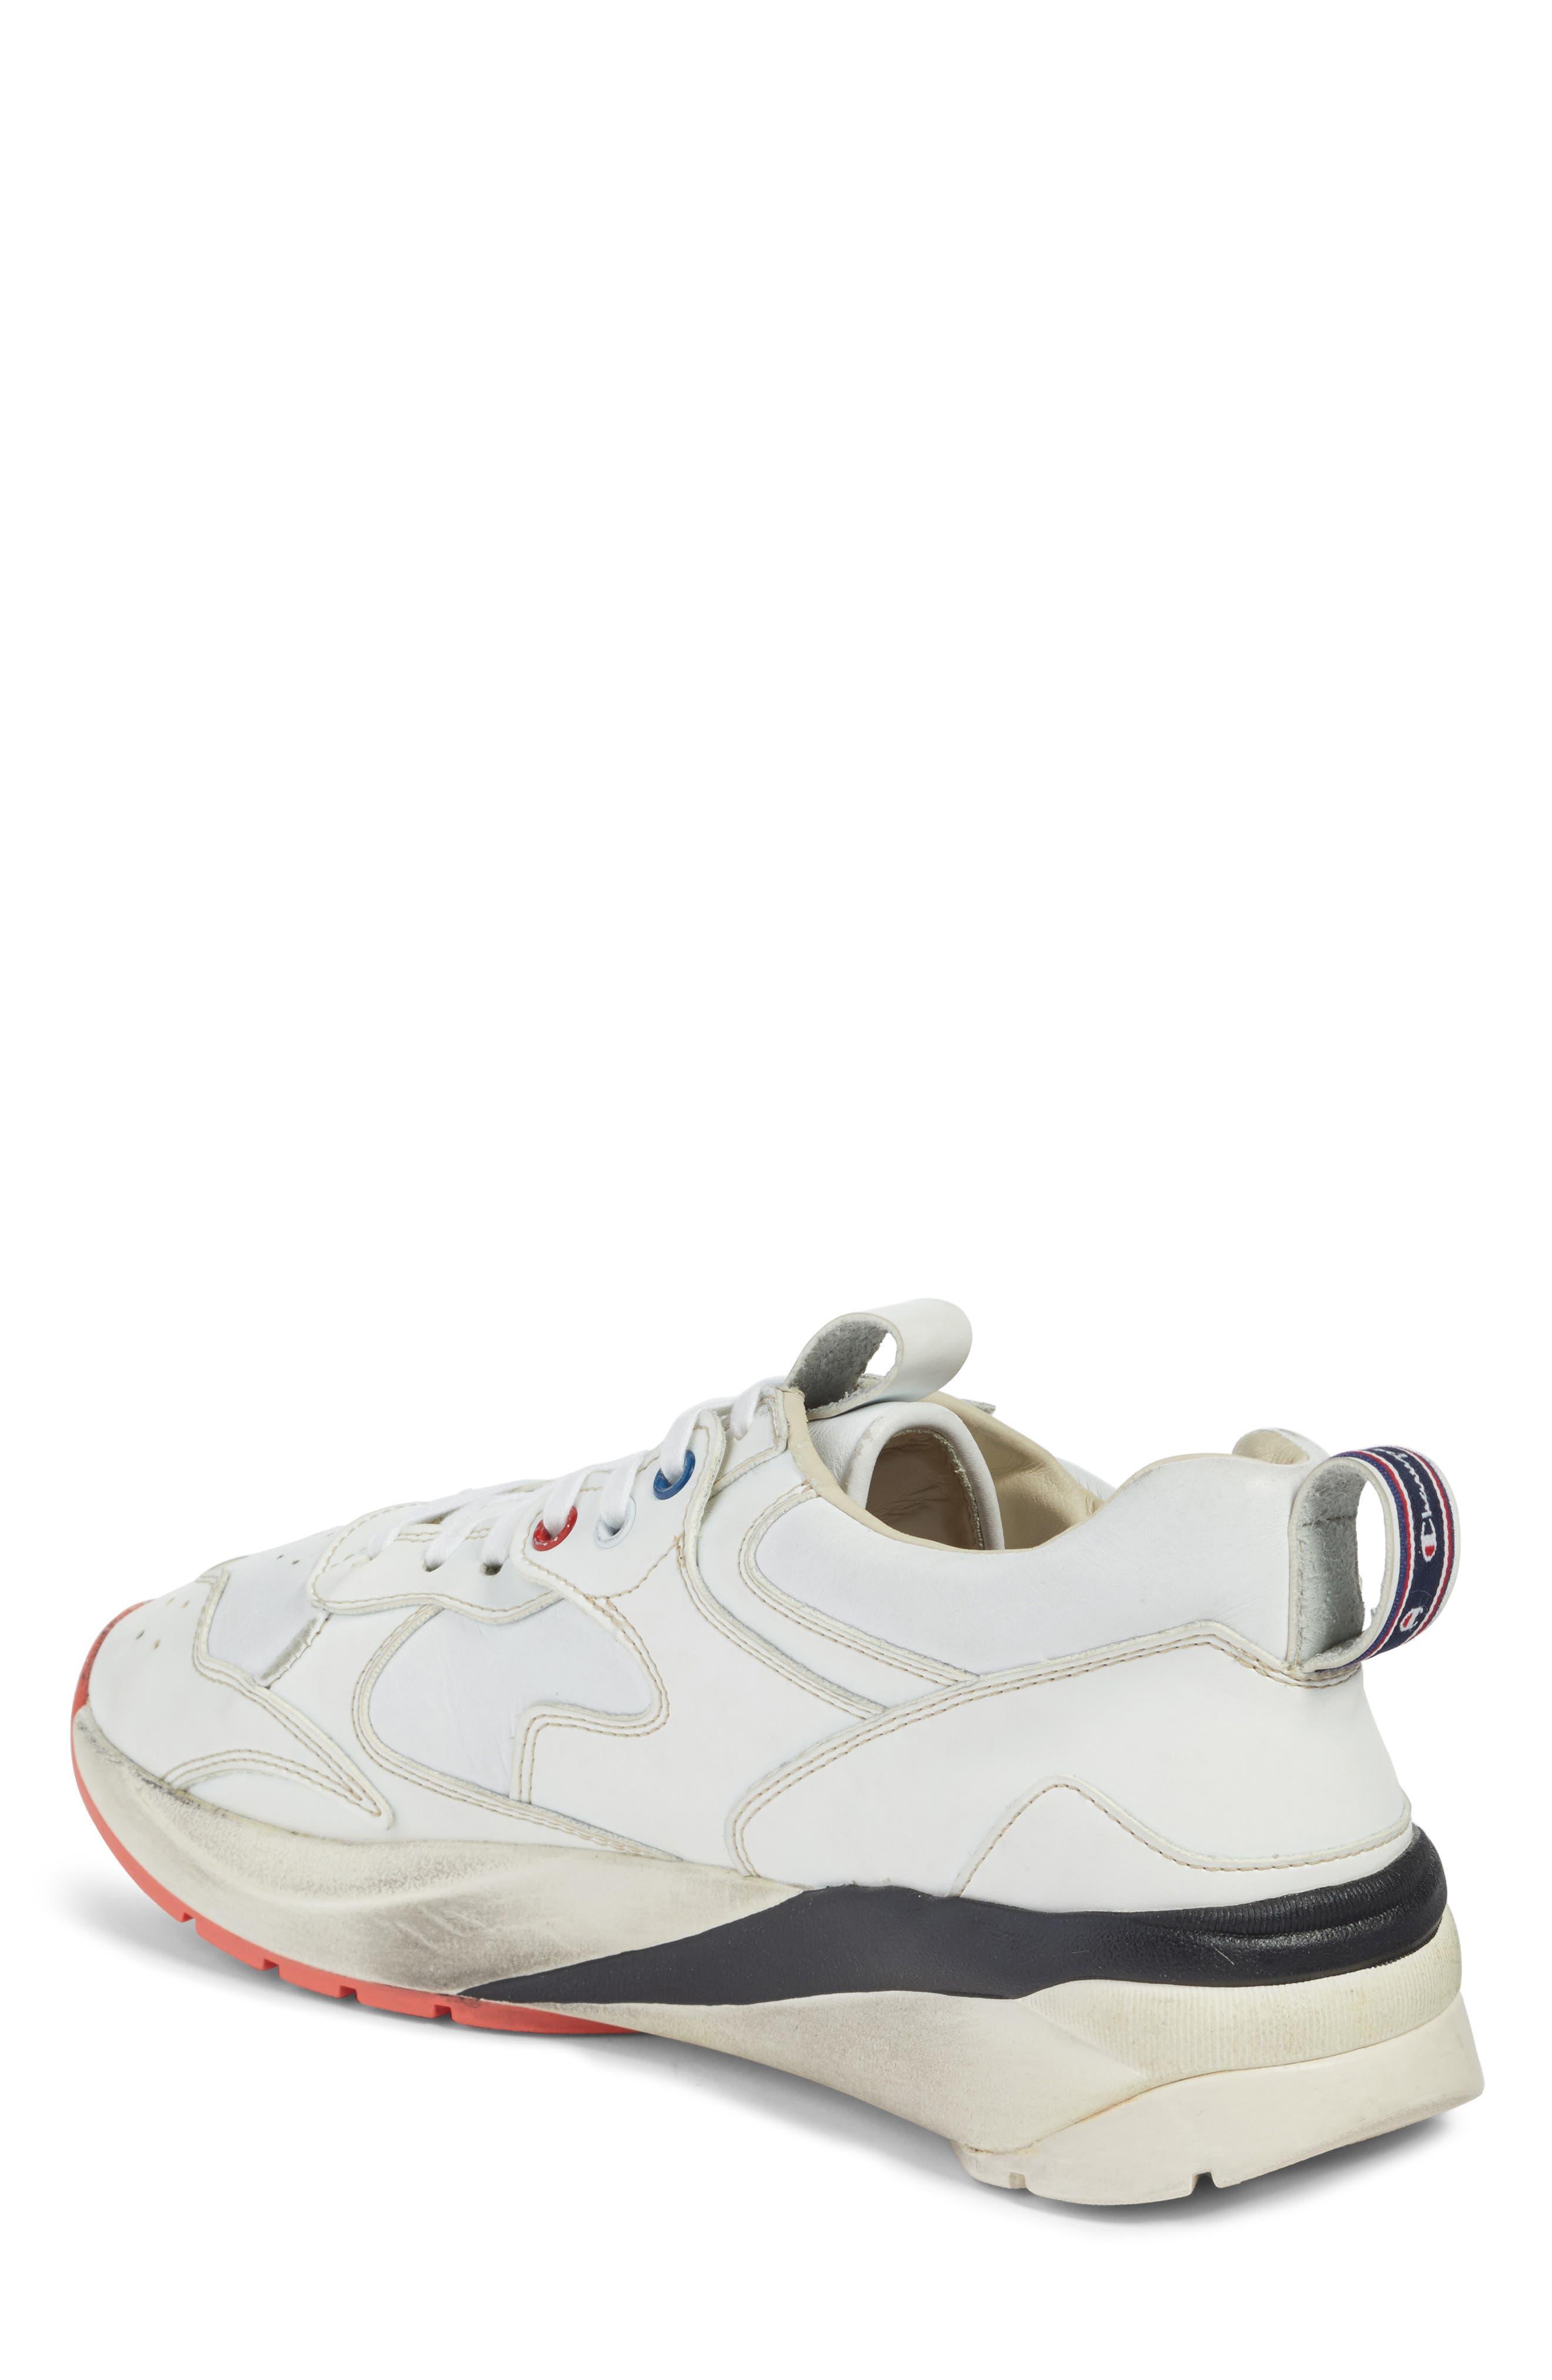 Champion Veloce ATL Sneaker,                             Alternate thumbnail 2, color,                             White Leather